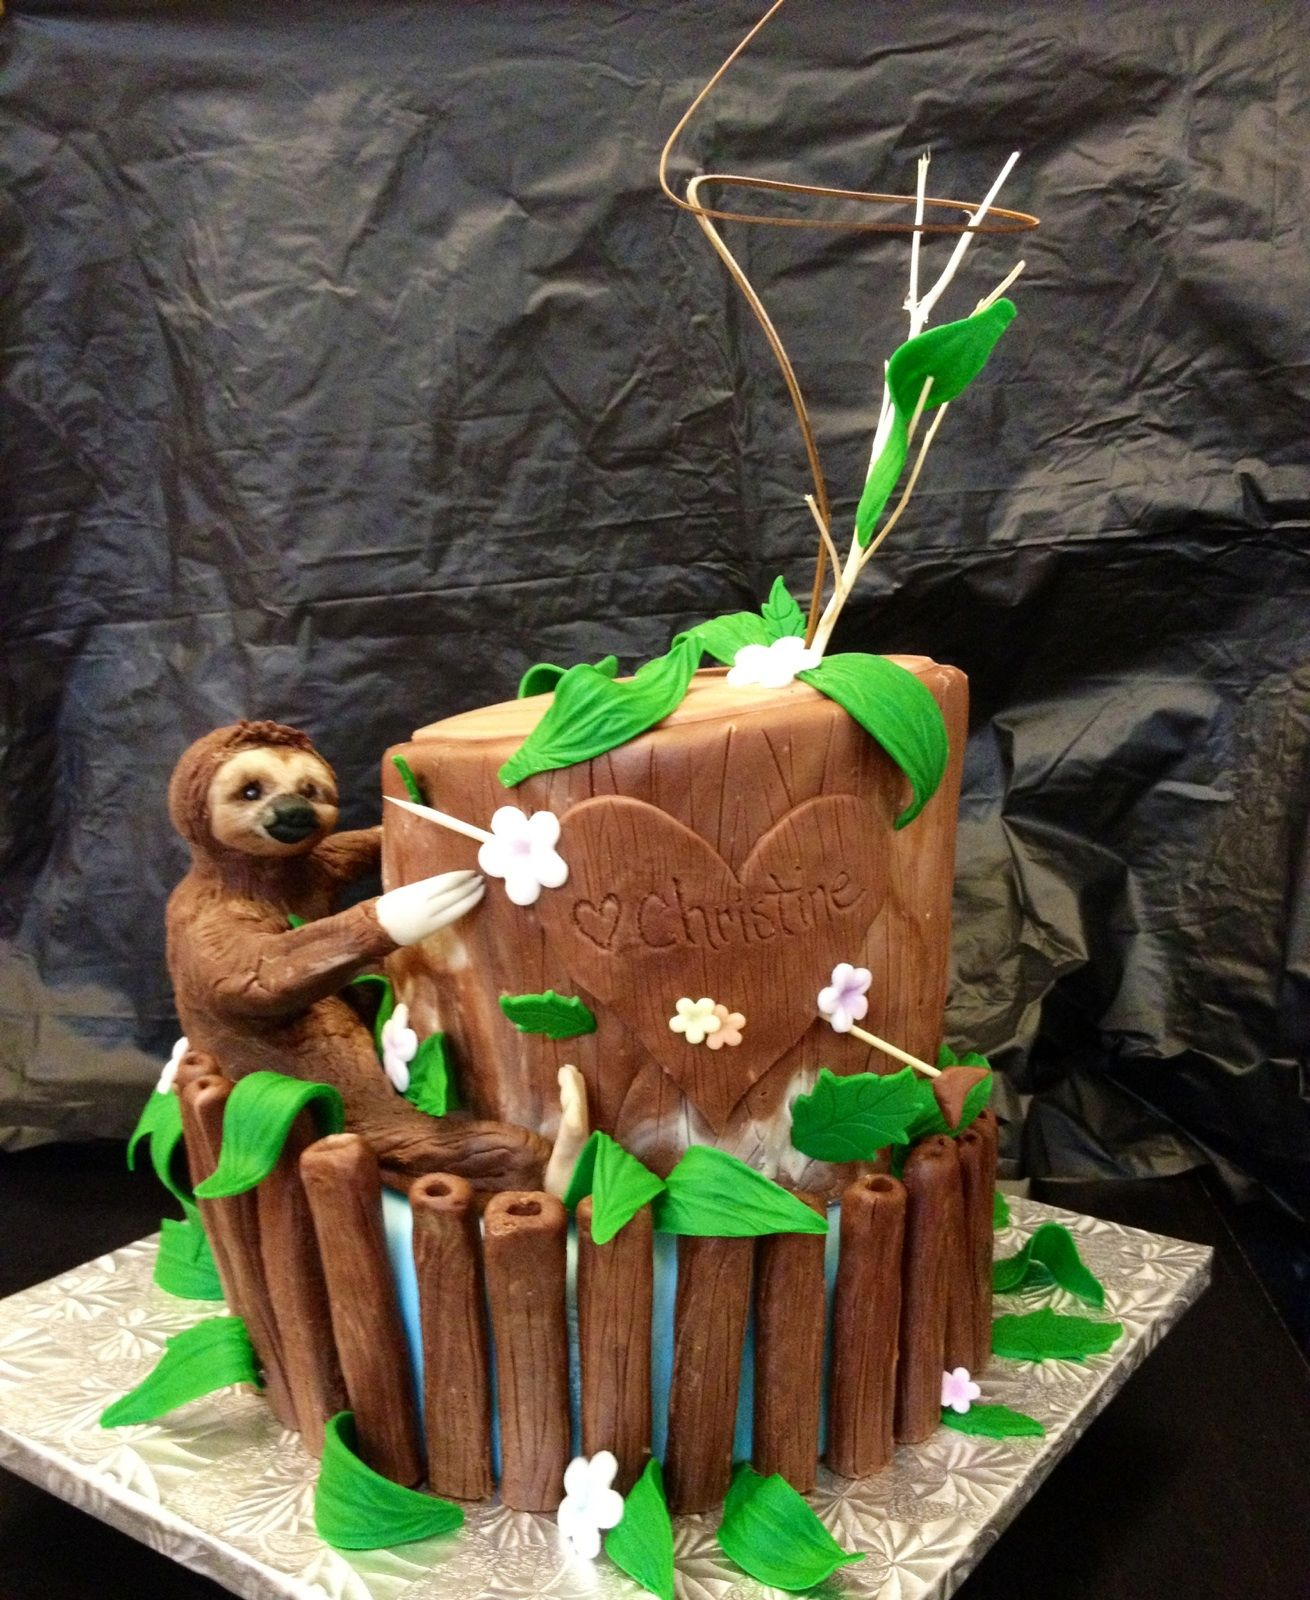 Sloth Birthday Party Decorations